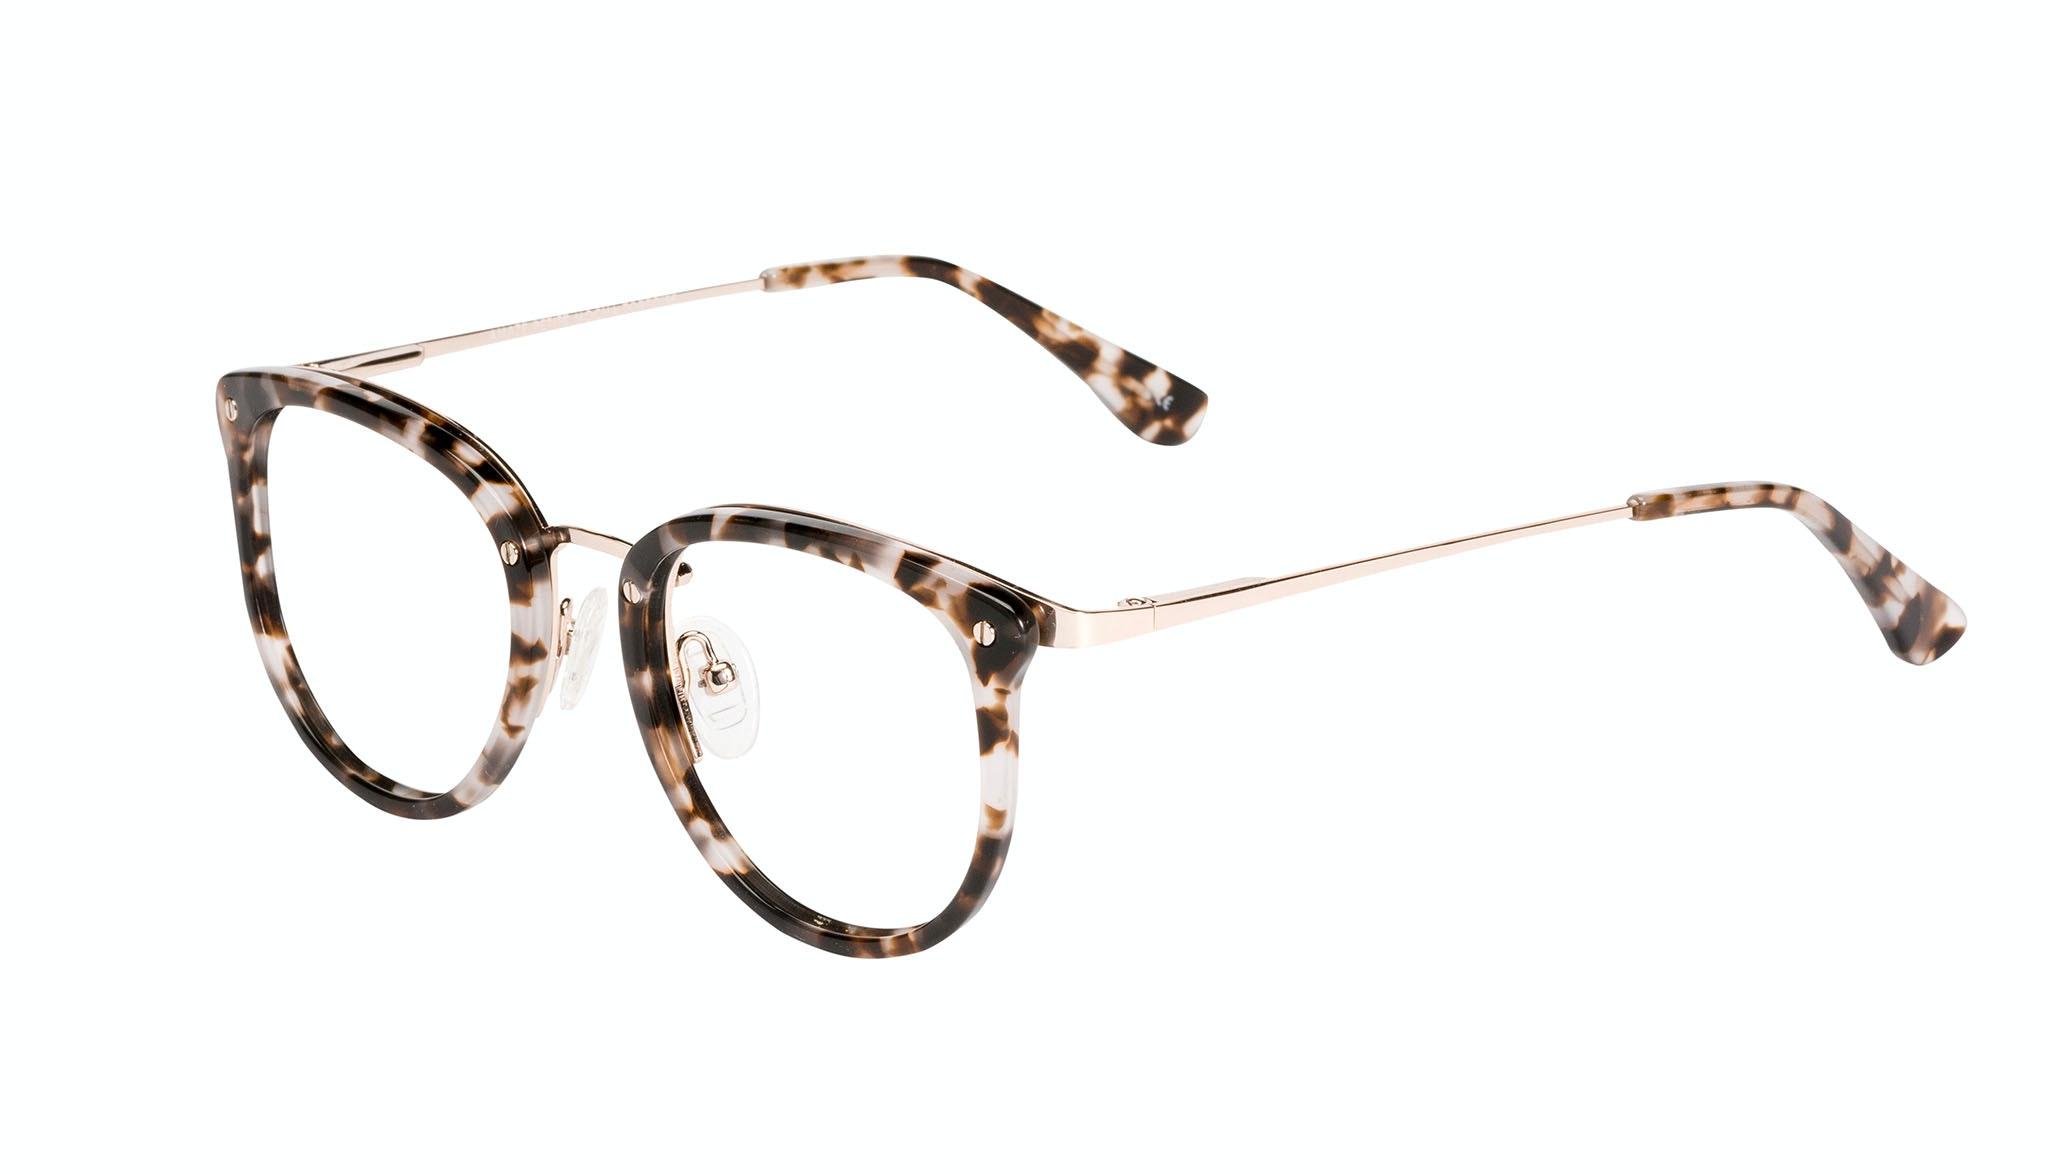 Affordable Fashion Glasses Round Eyeglasses Women Amaze Petite Mocha Tort Tilt